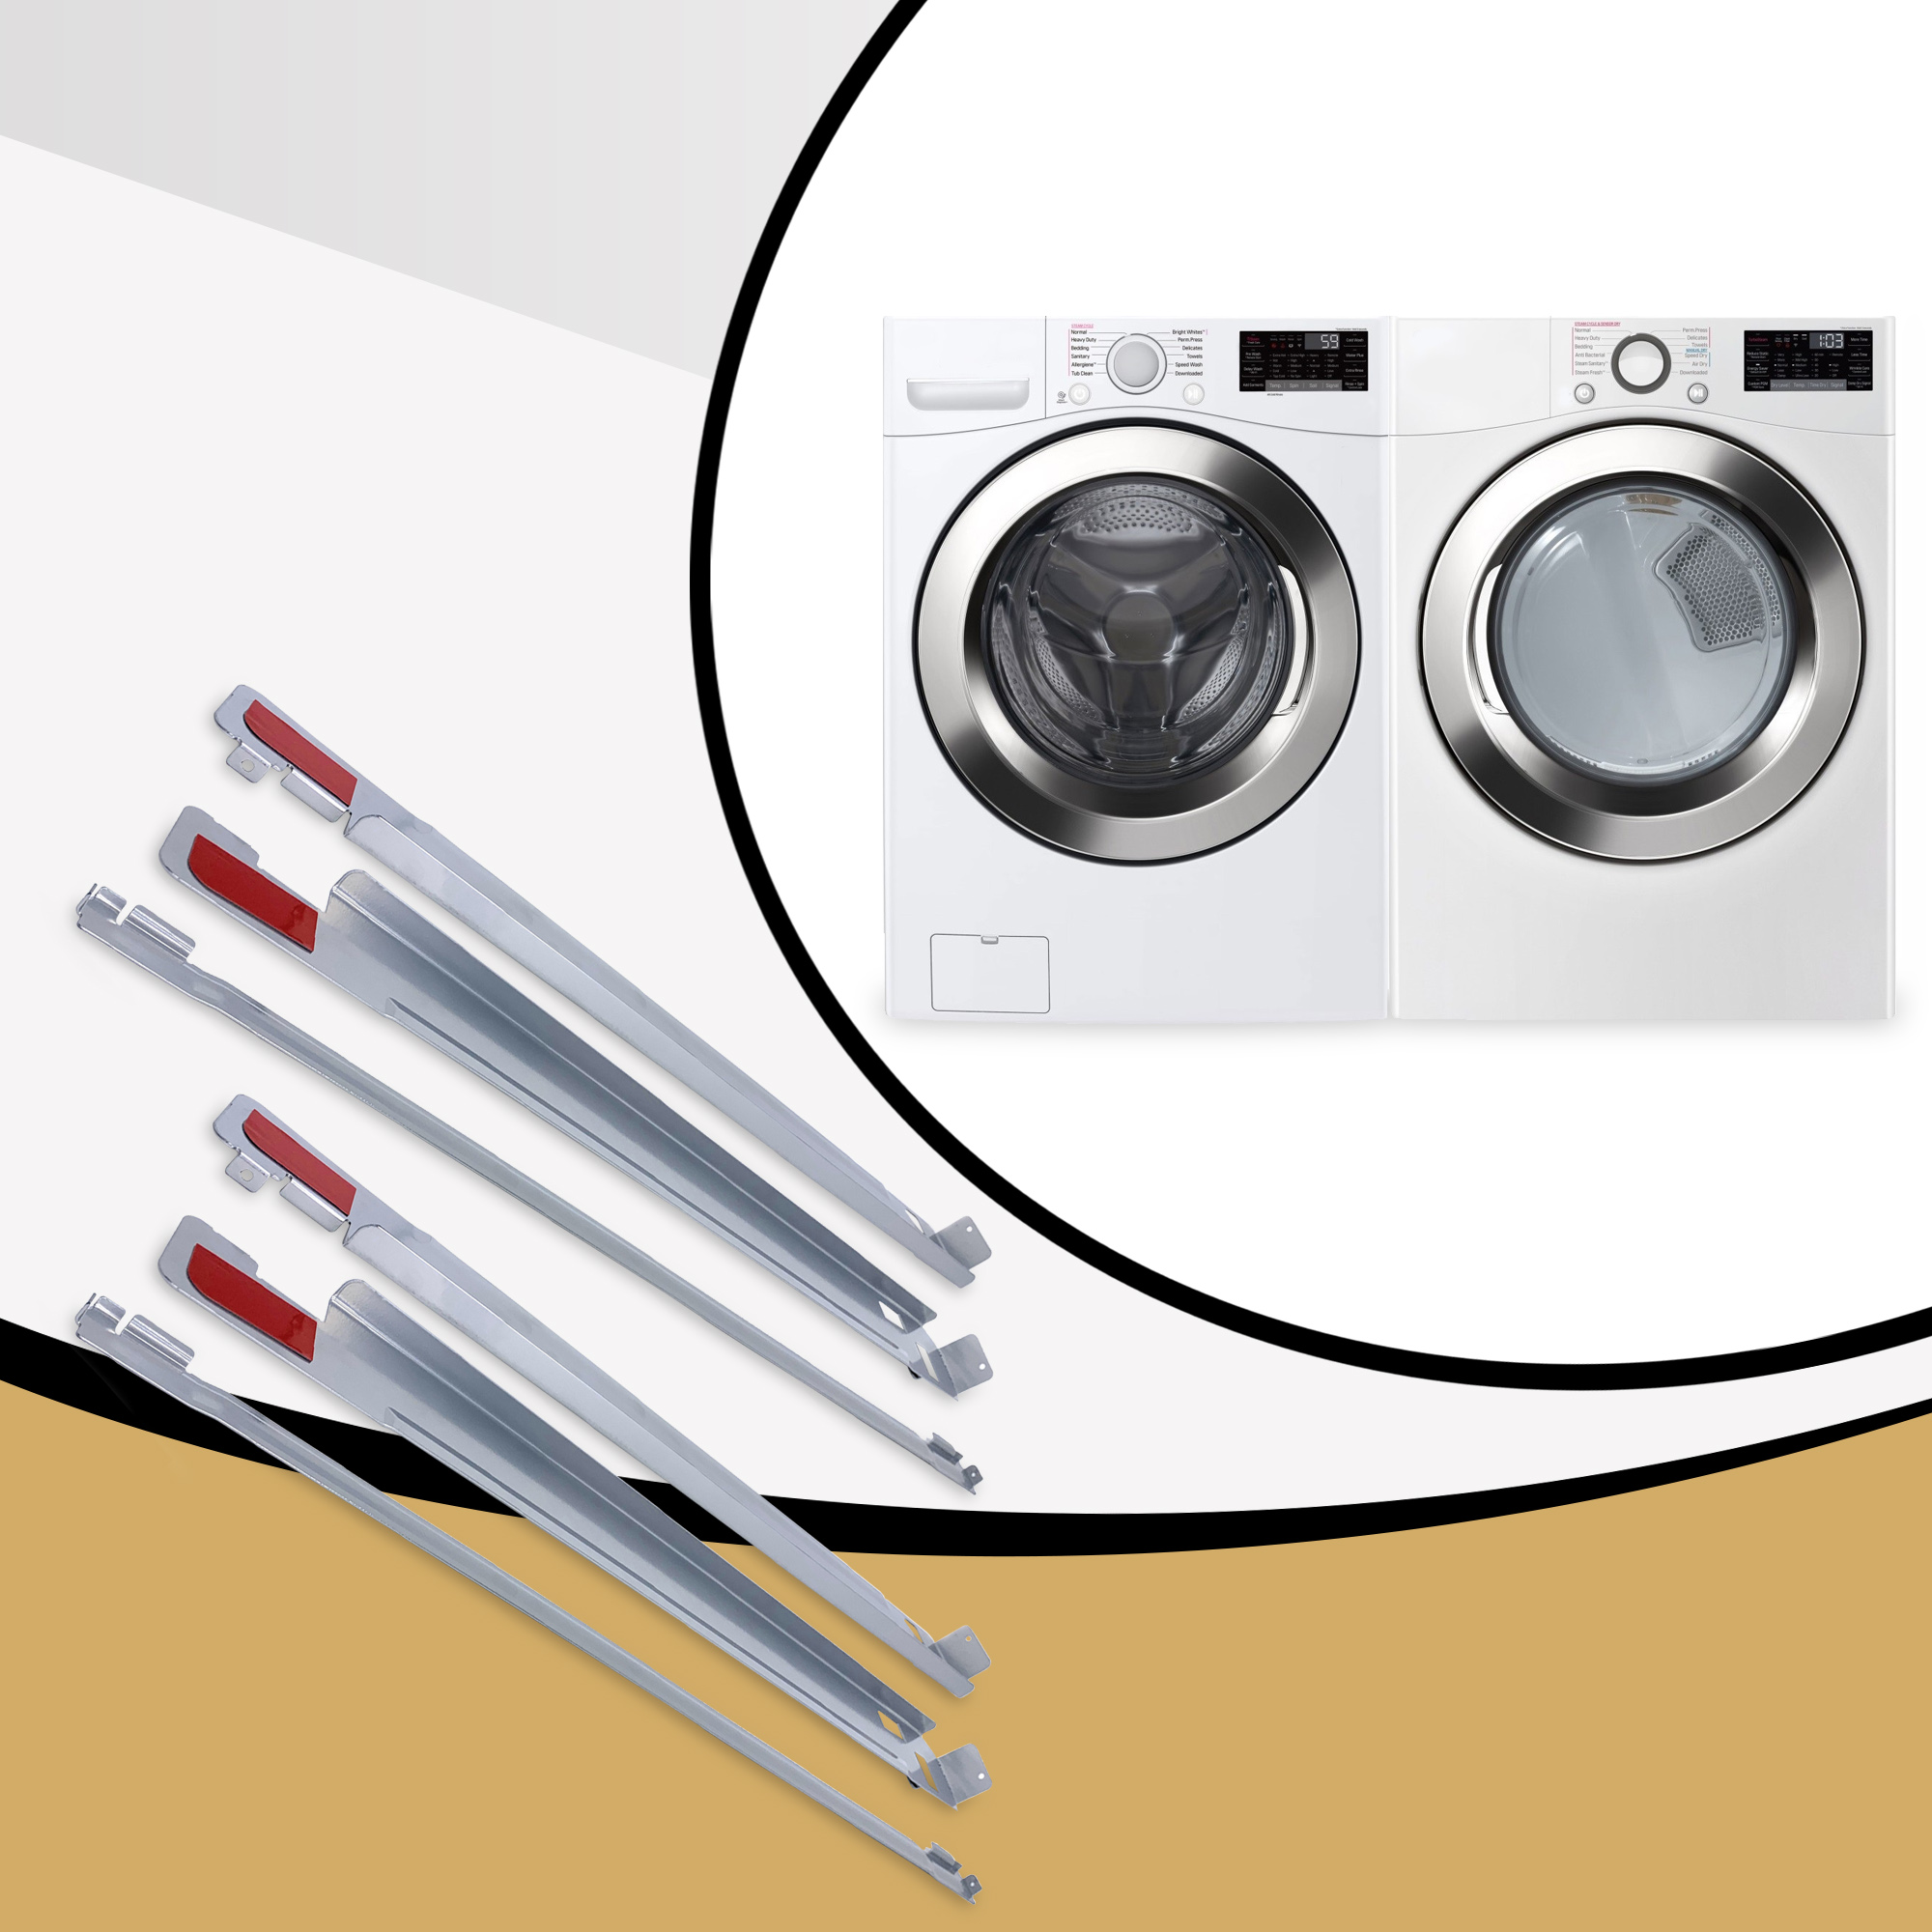 Appliance Pros 27 Inch Chrome Laundry Stacking Kit For LG Washers Part KSTK1 2-Pack